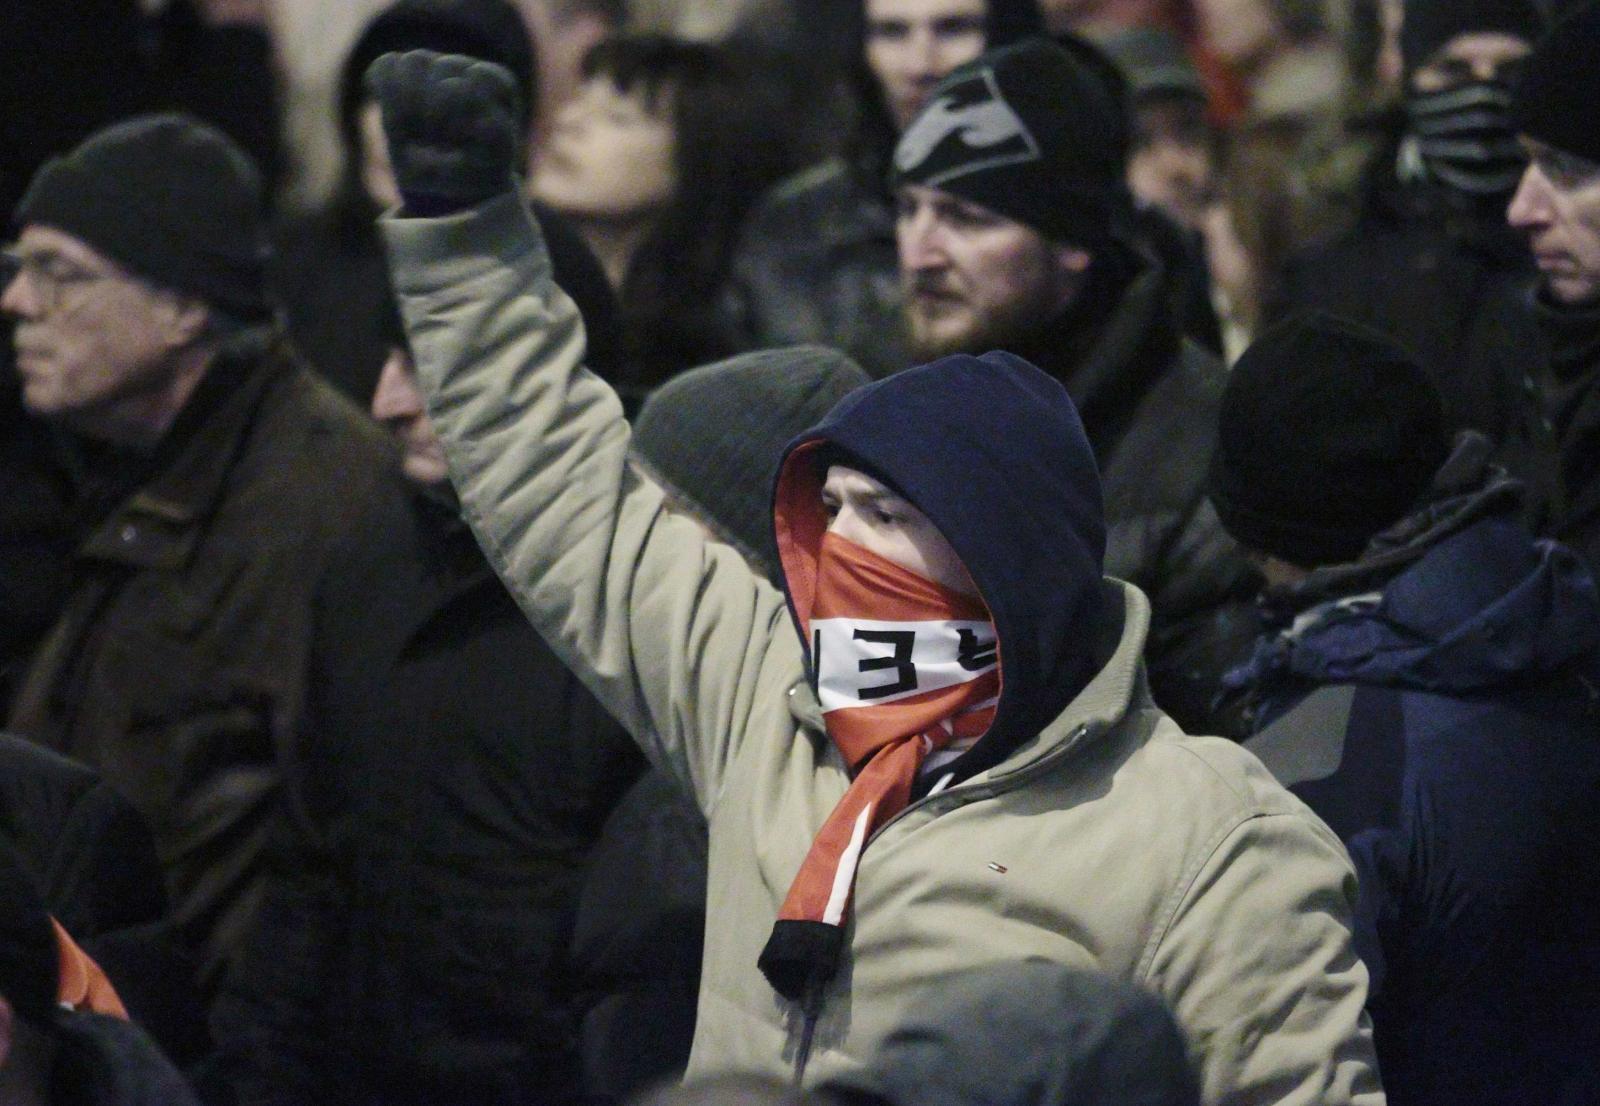 'Nazi salutes' claims as Pegida march through Vienna